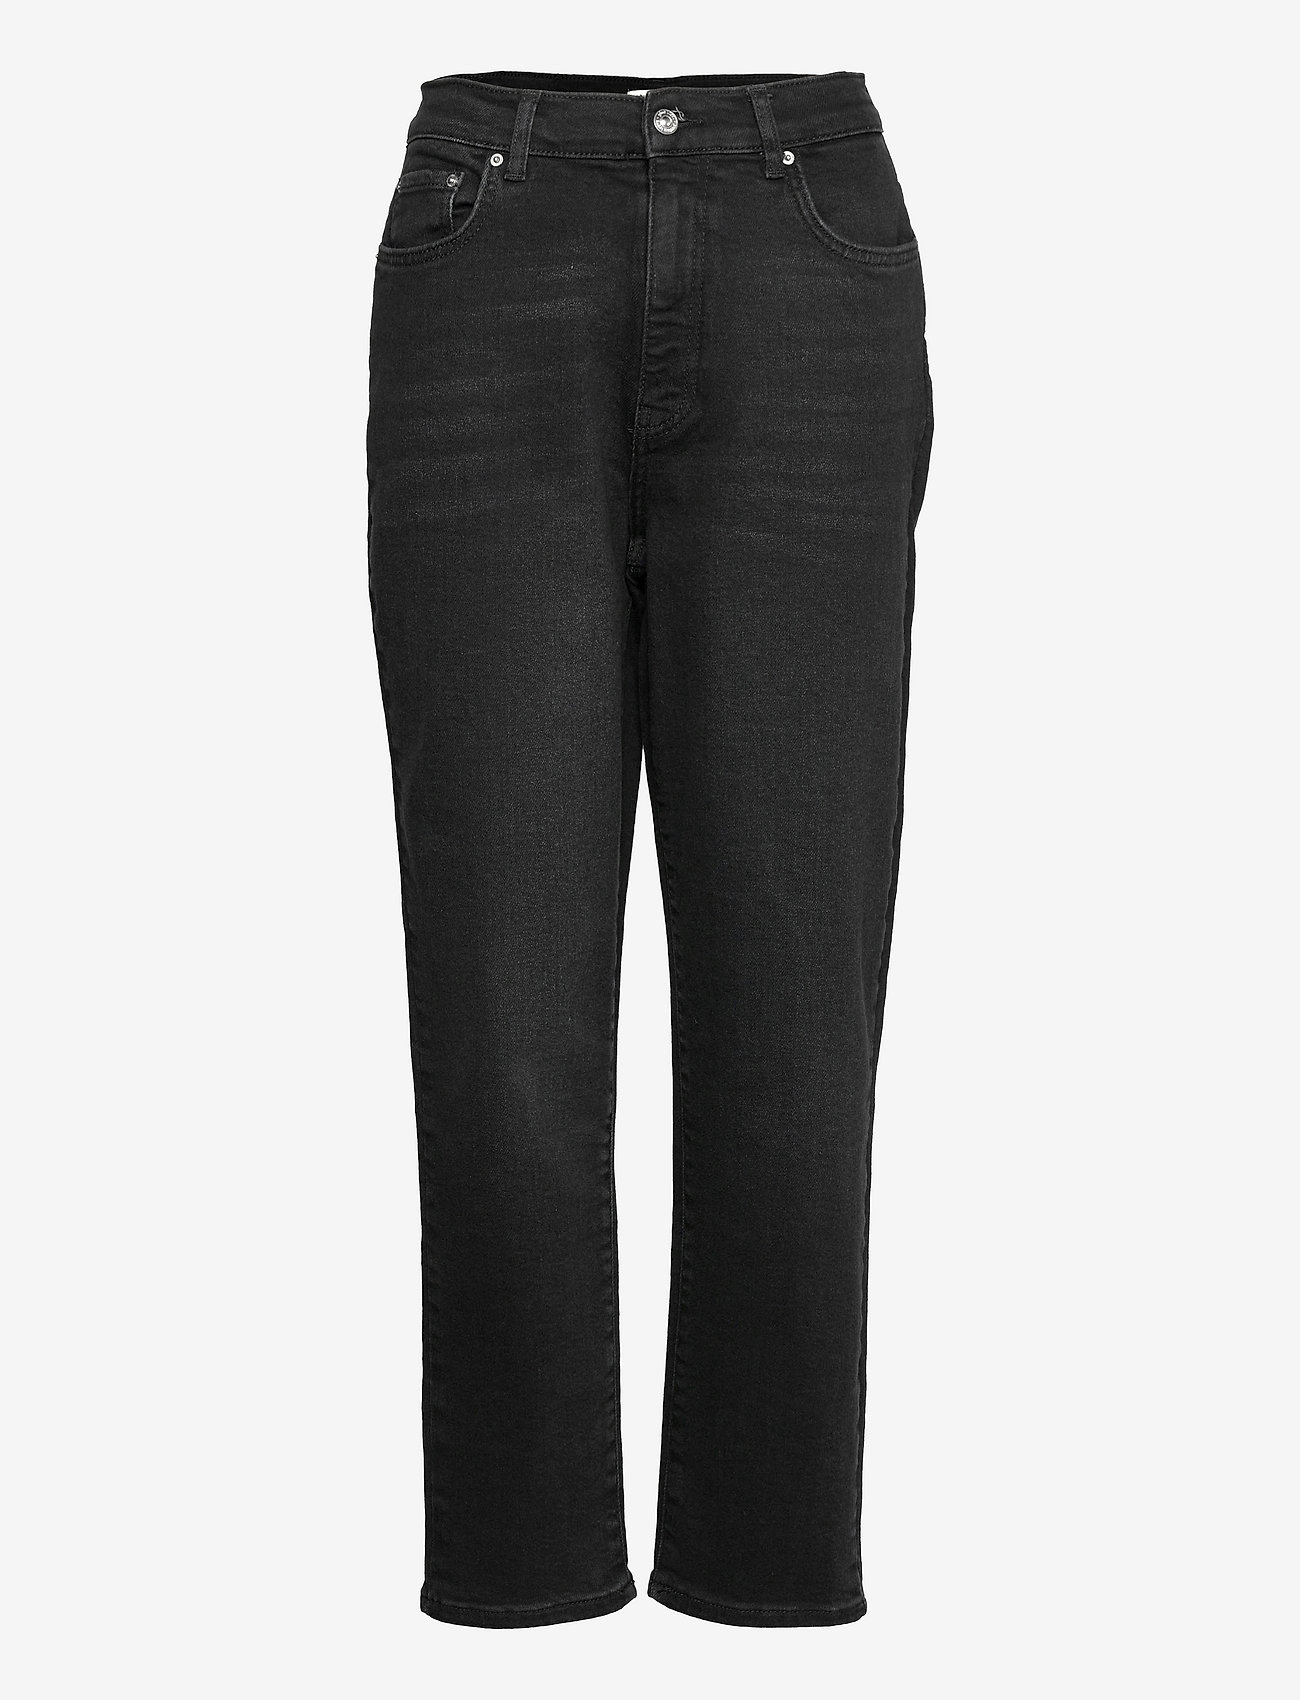 Gina Tricot - Comfy mom jeans - mom jeans - black (9000) - 0